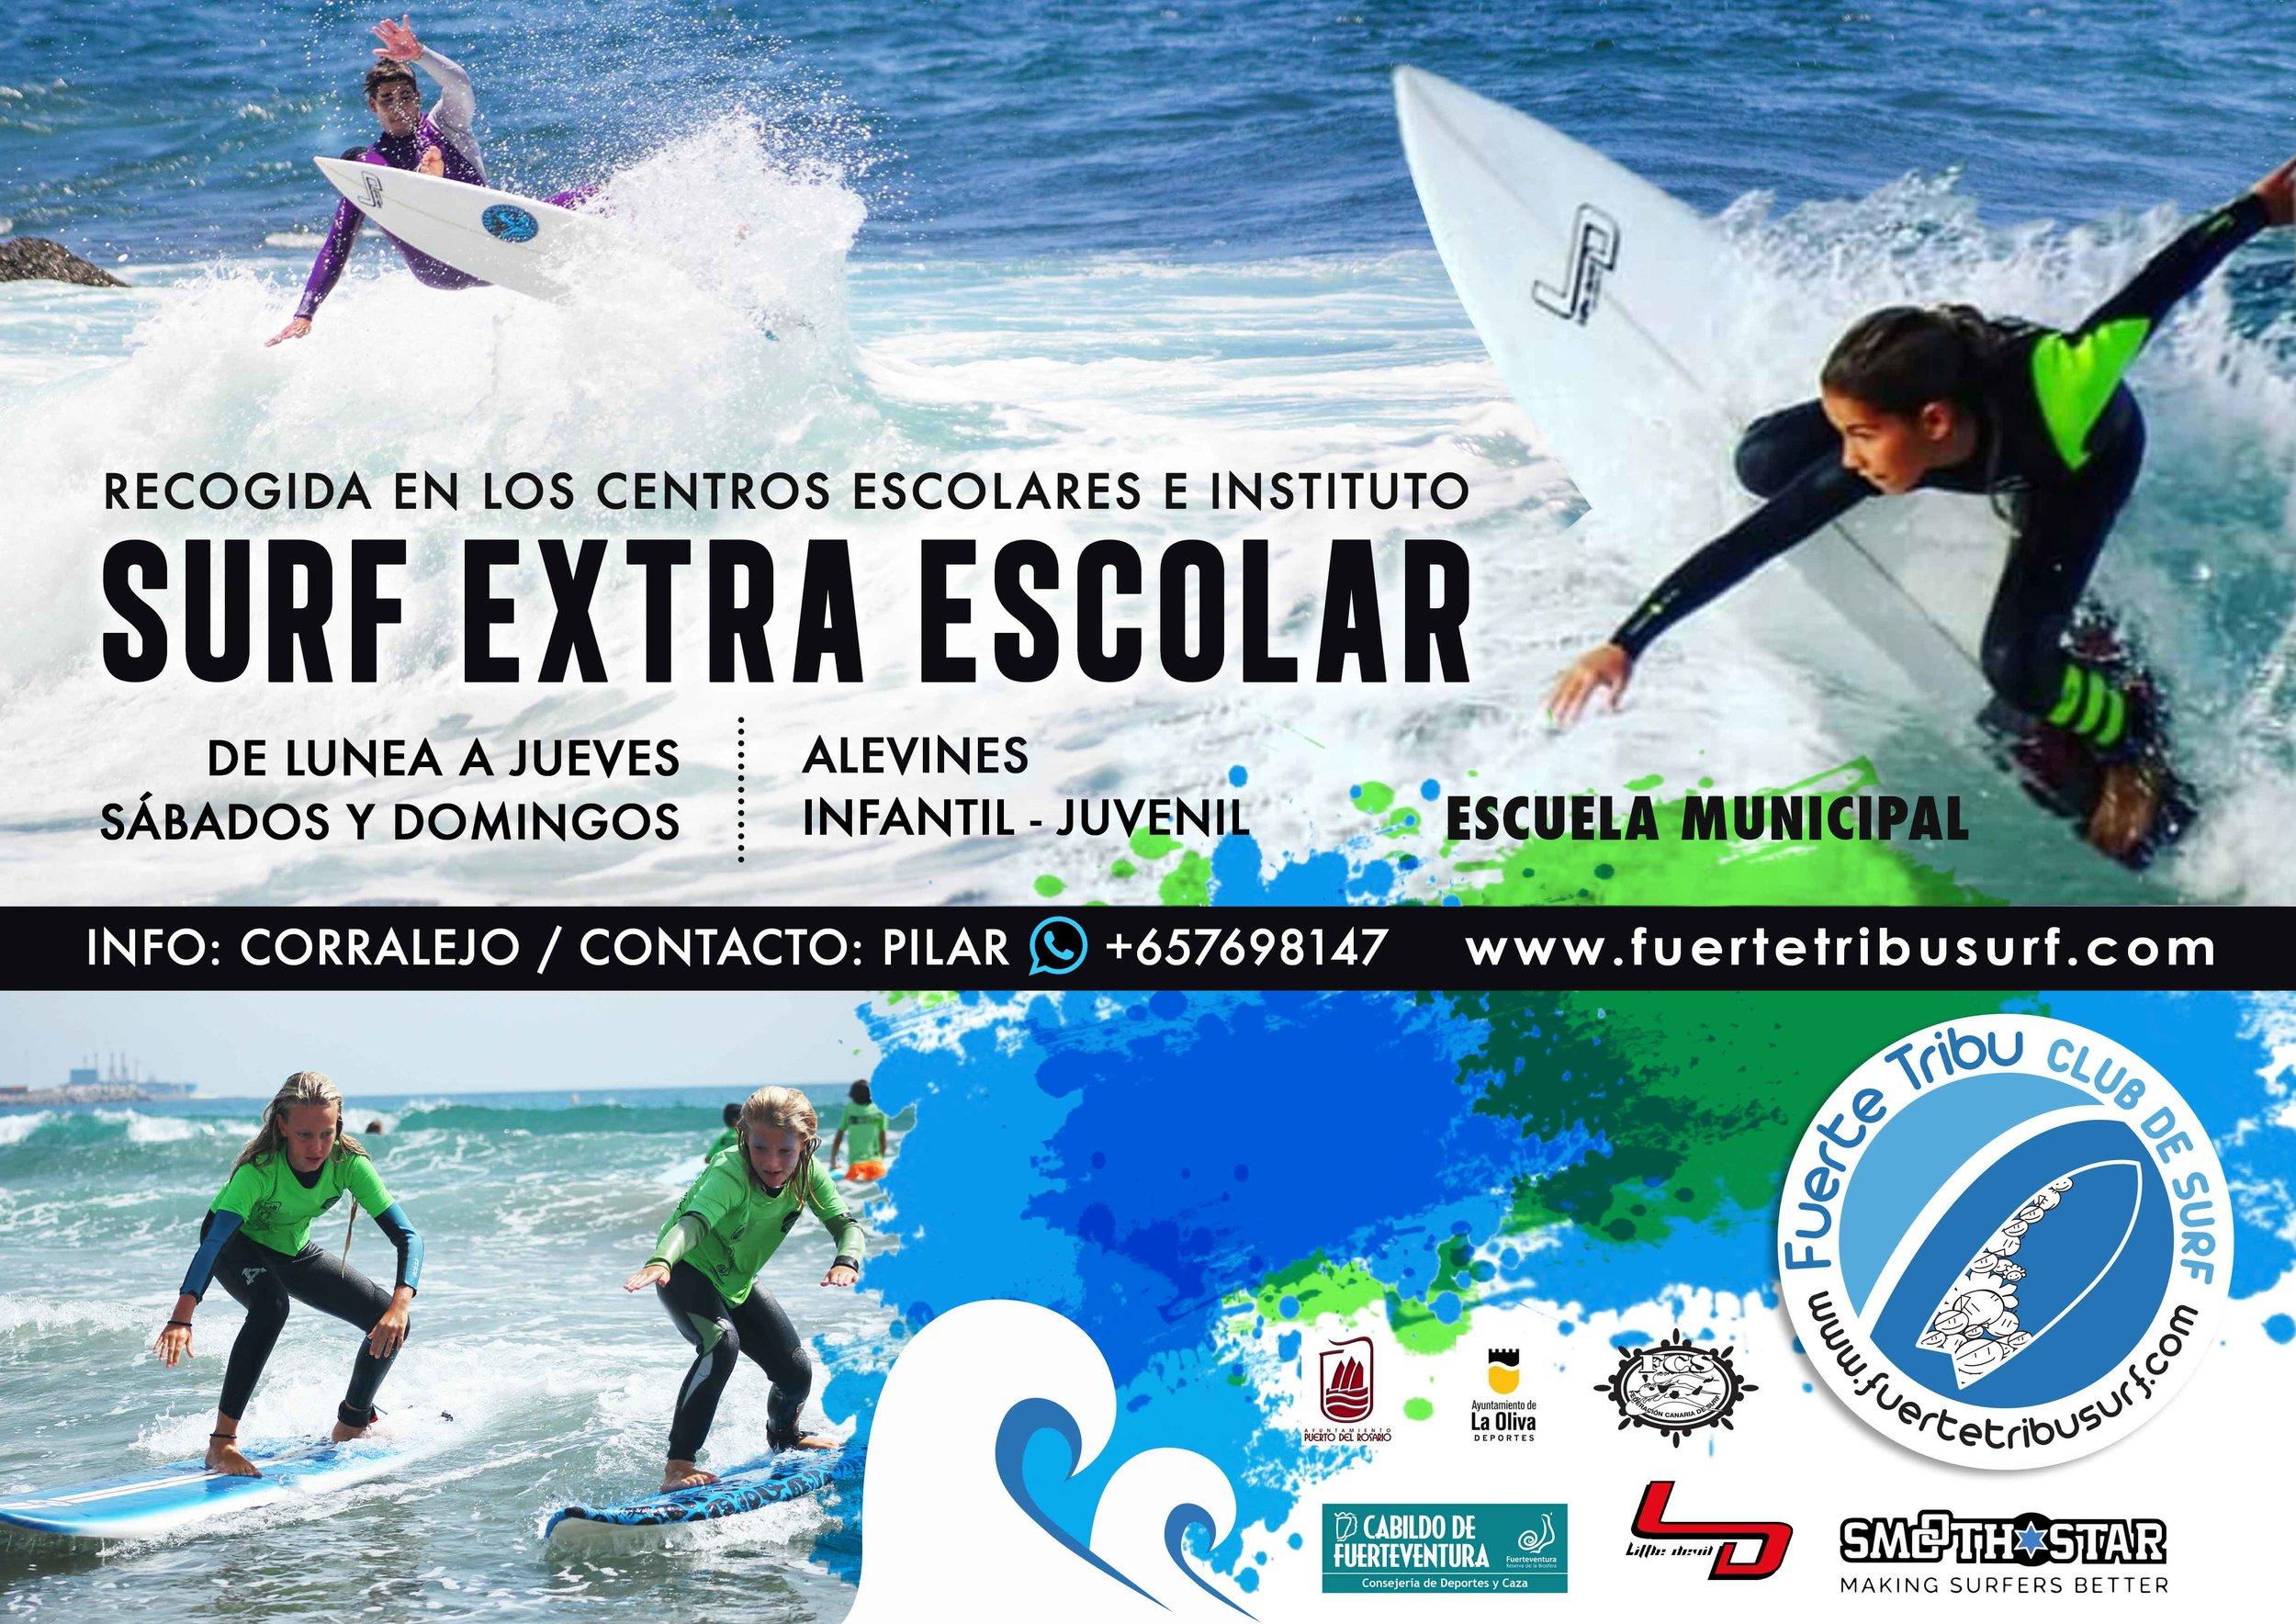 surfextraescolar2017 corralejo.jpg